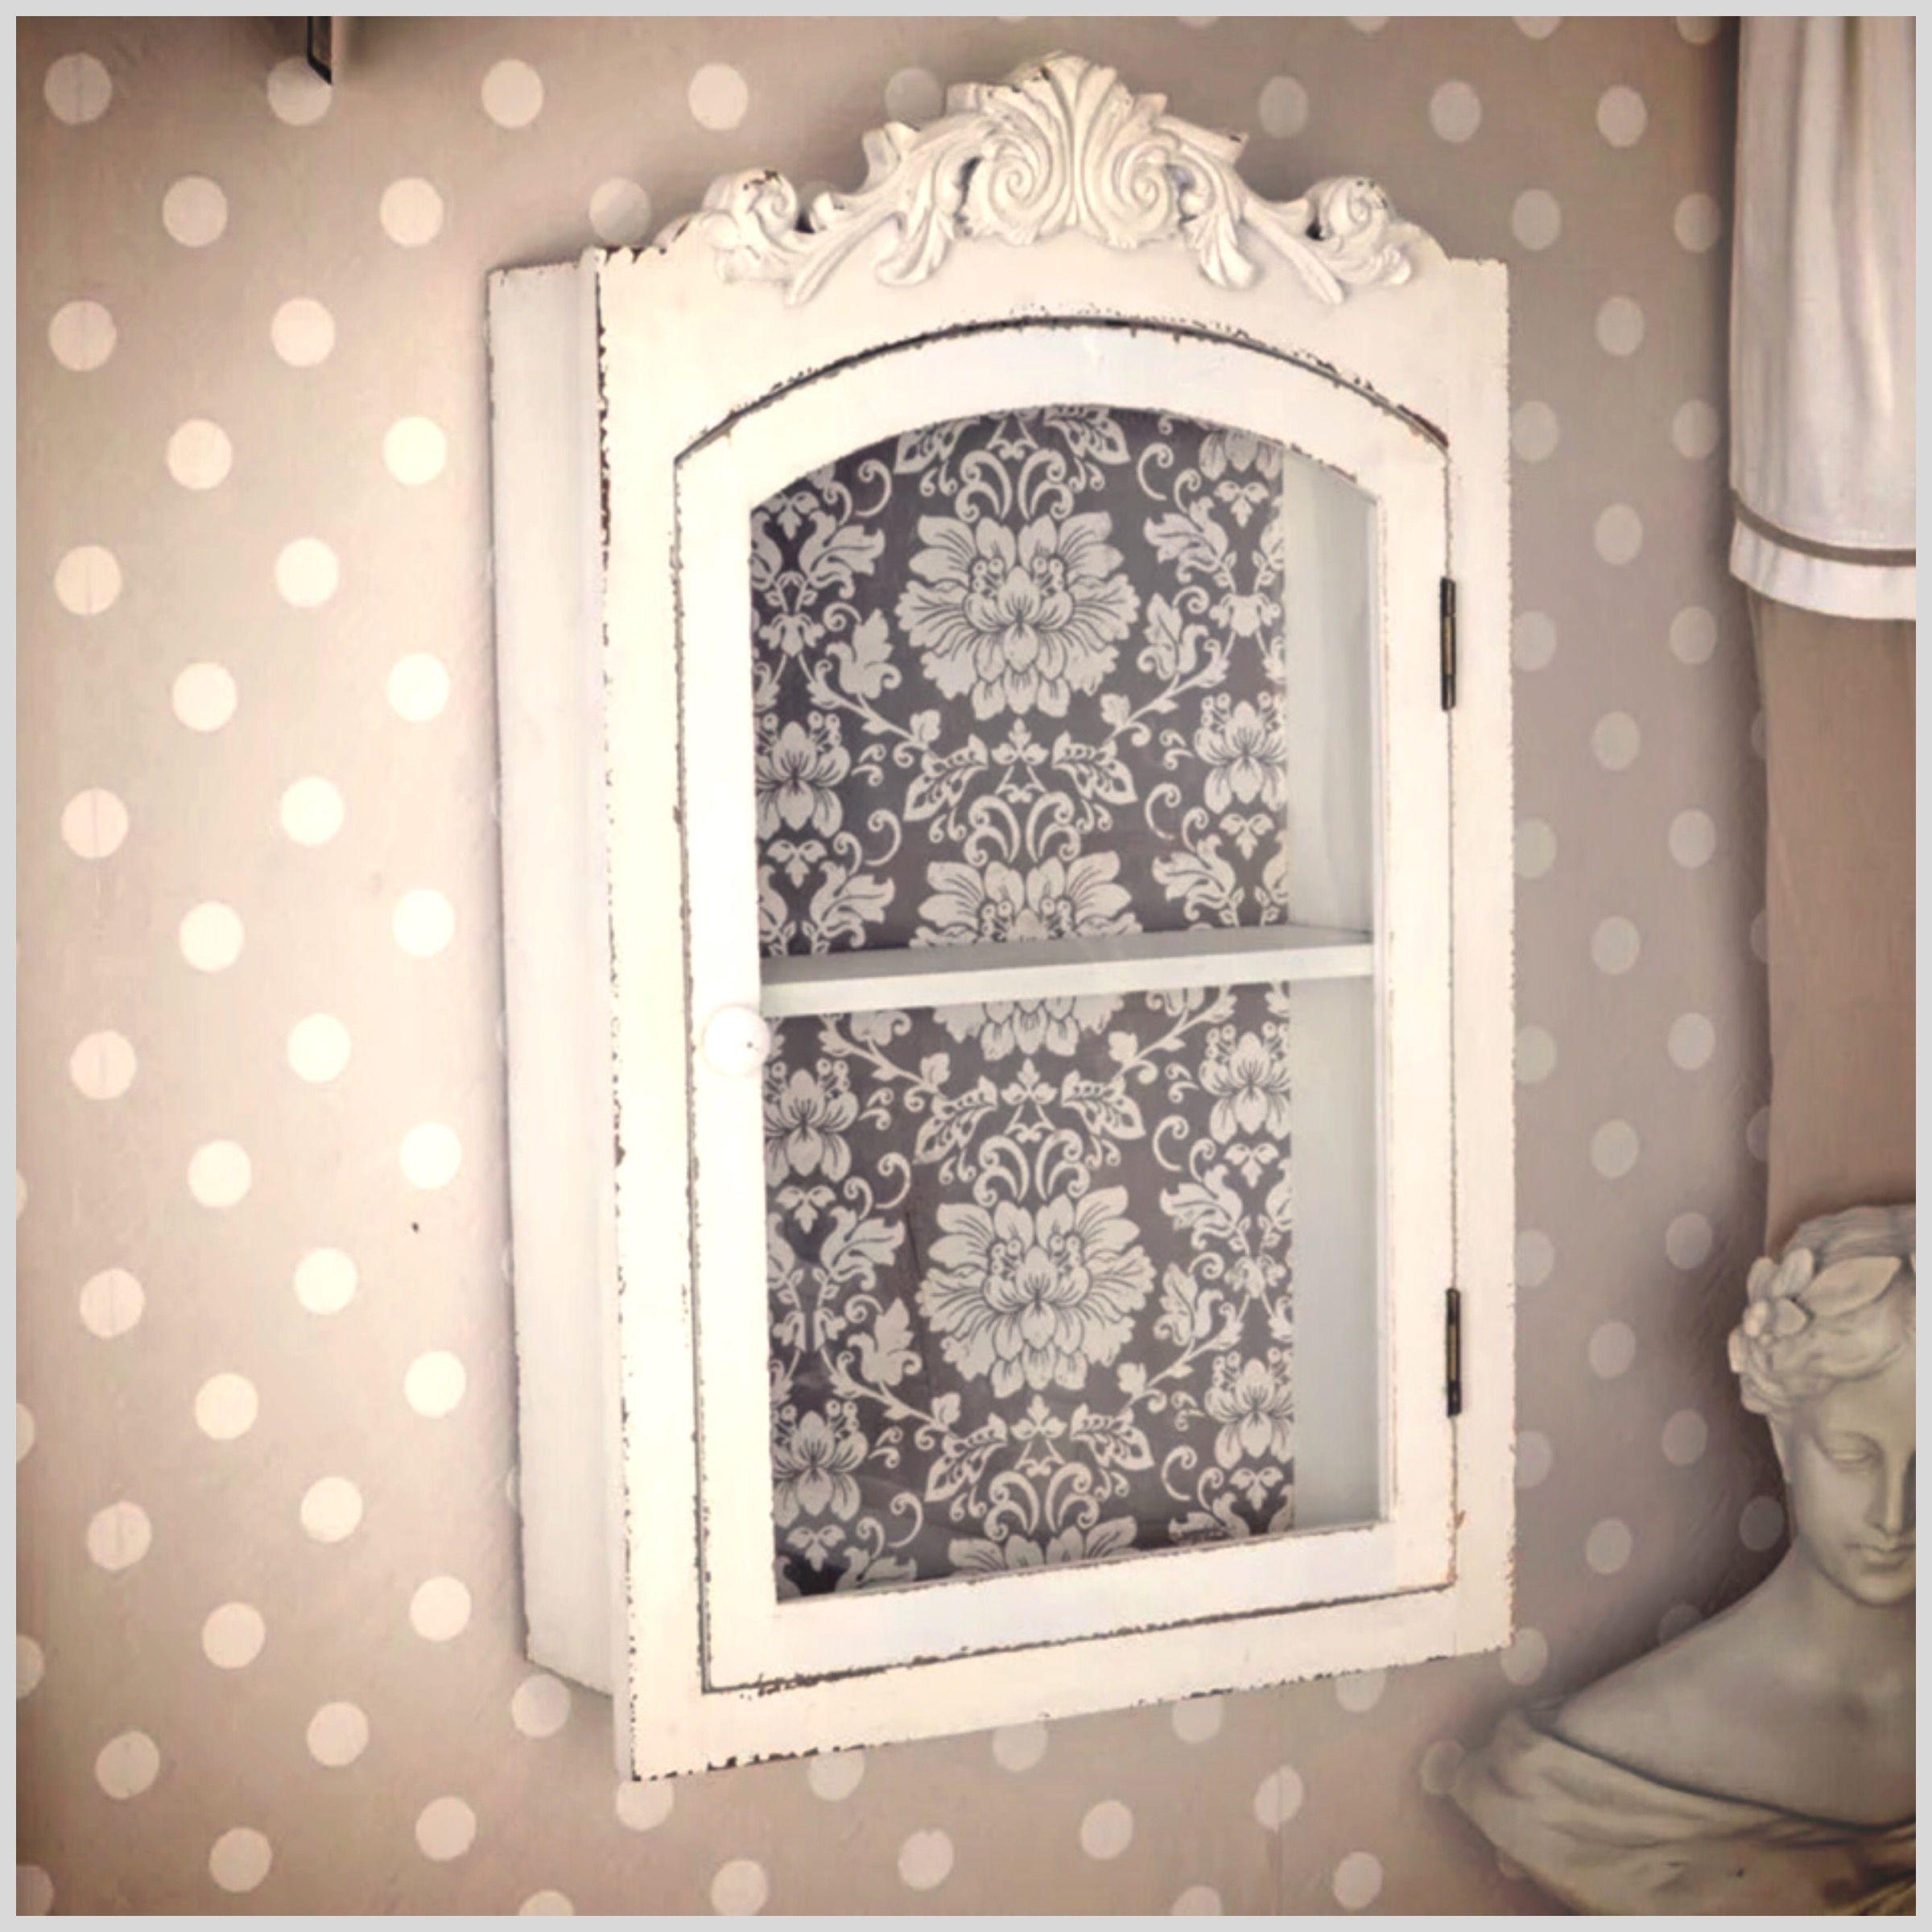 Wand Schrank Shabby Chic Vintage Retro | Home - Decoration - Ideas ...